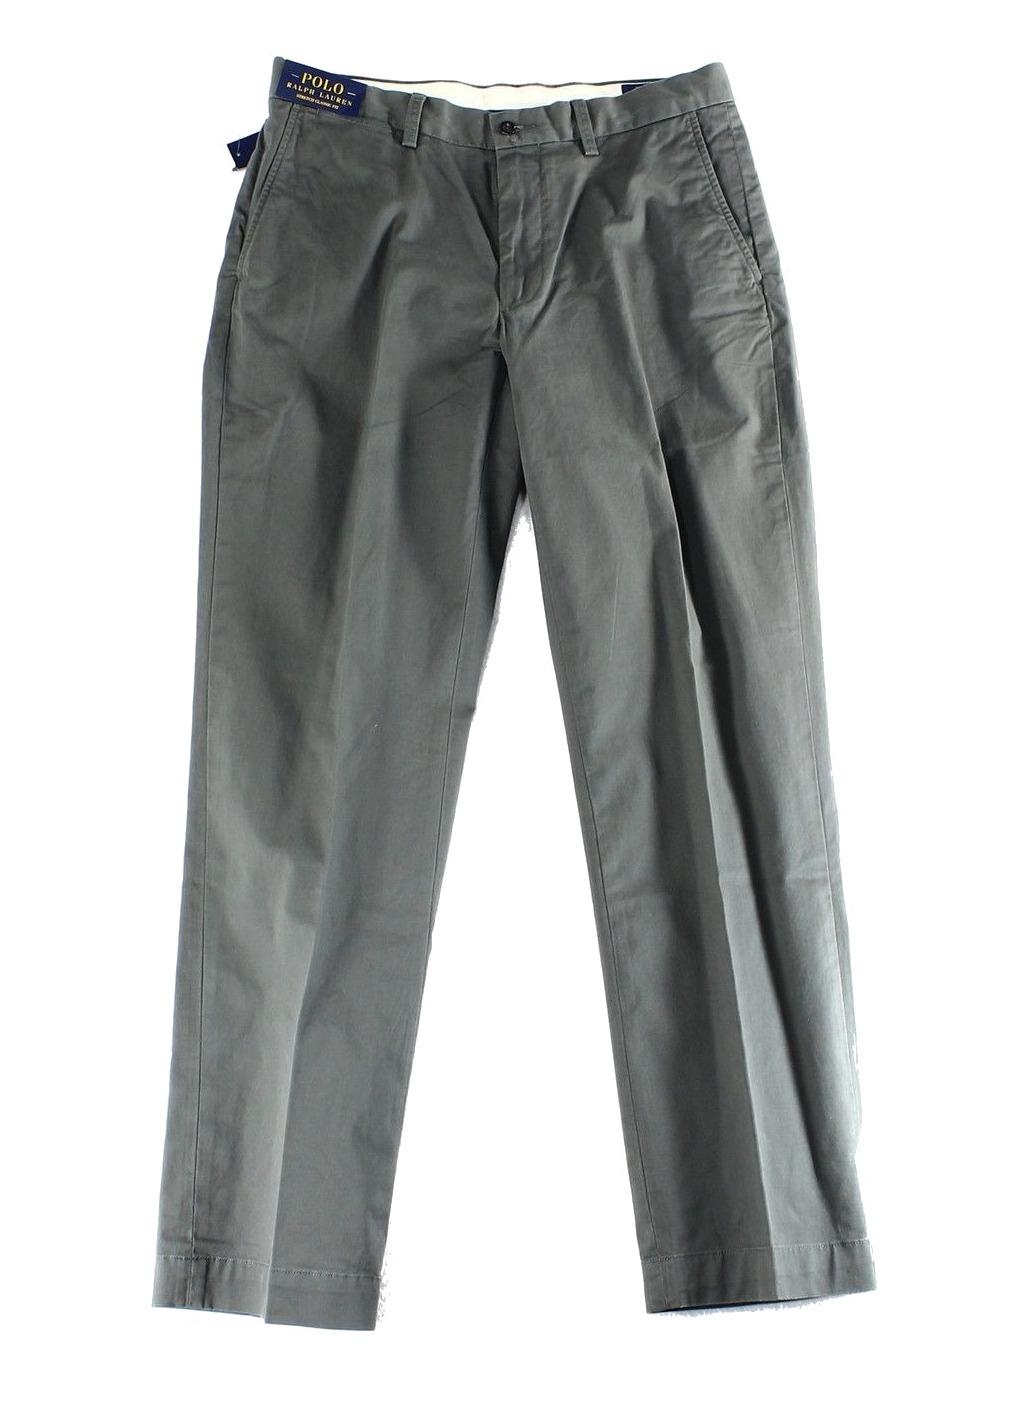 Polo Ralph Lauren NEW Gray Mens Size 34X30 Classic Fit Khakis Pants